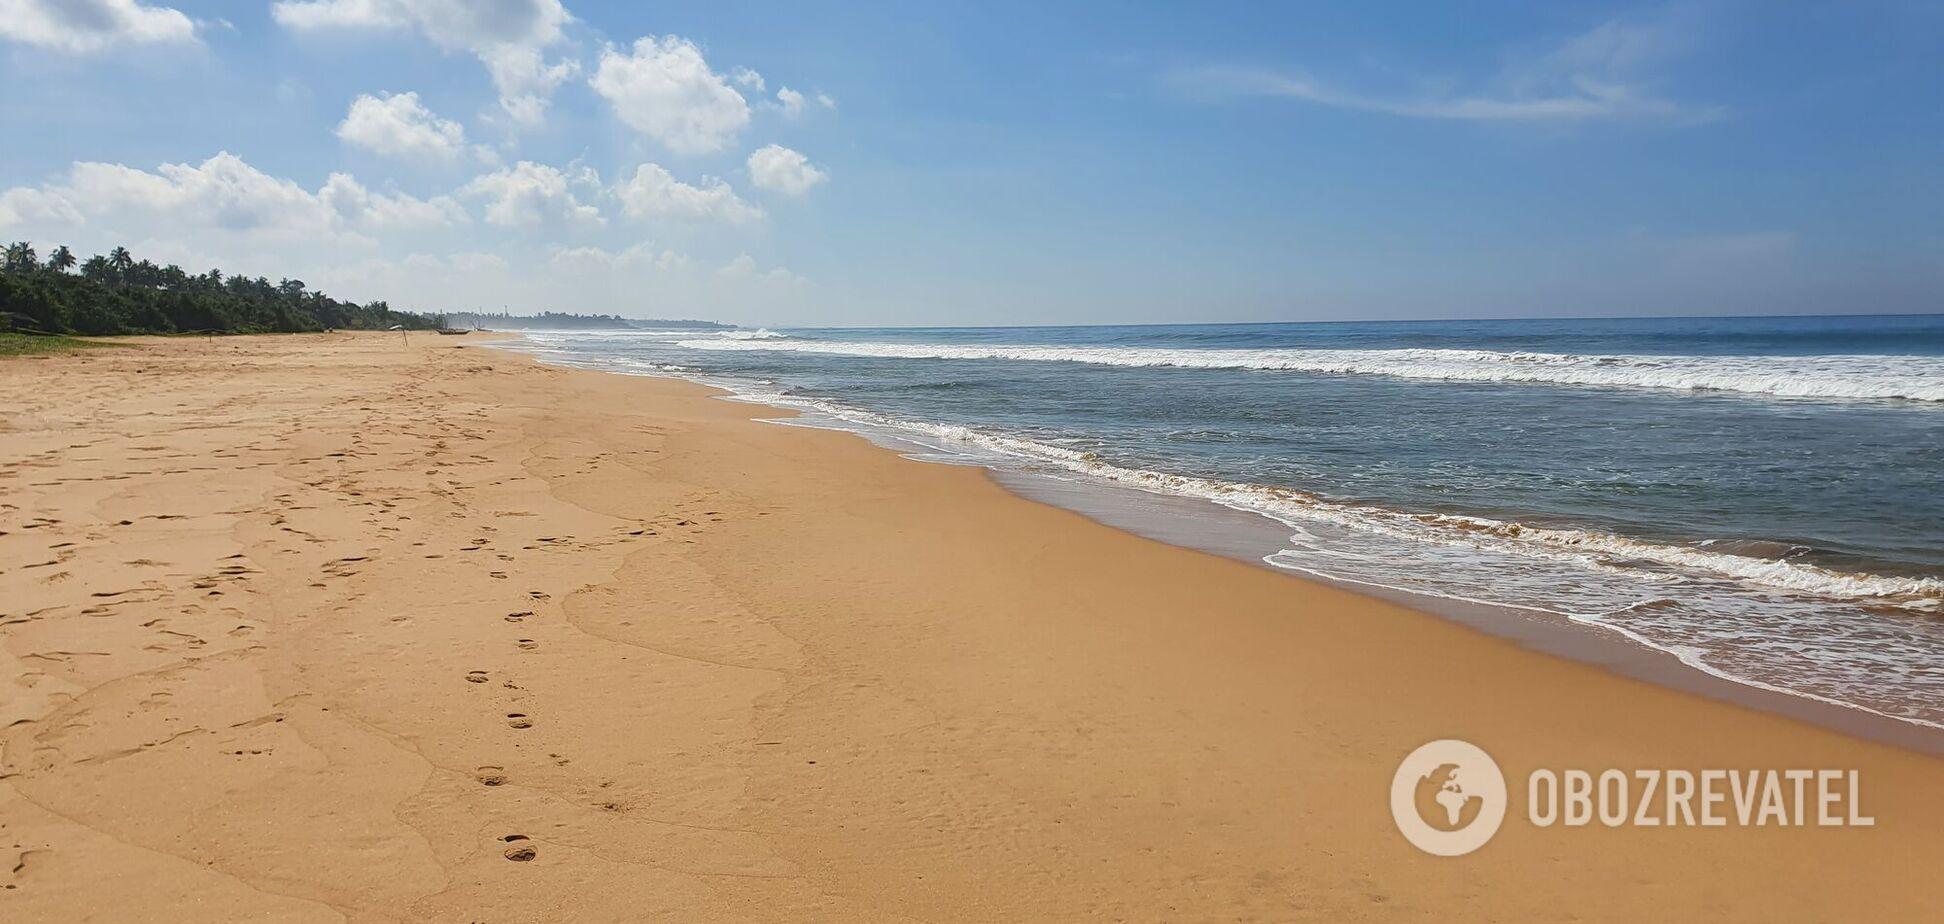 Шри-Ланка 2021: особенности отдыха в карантин